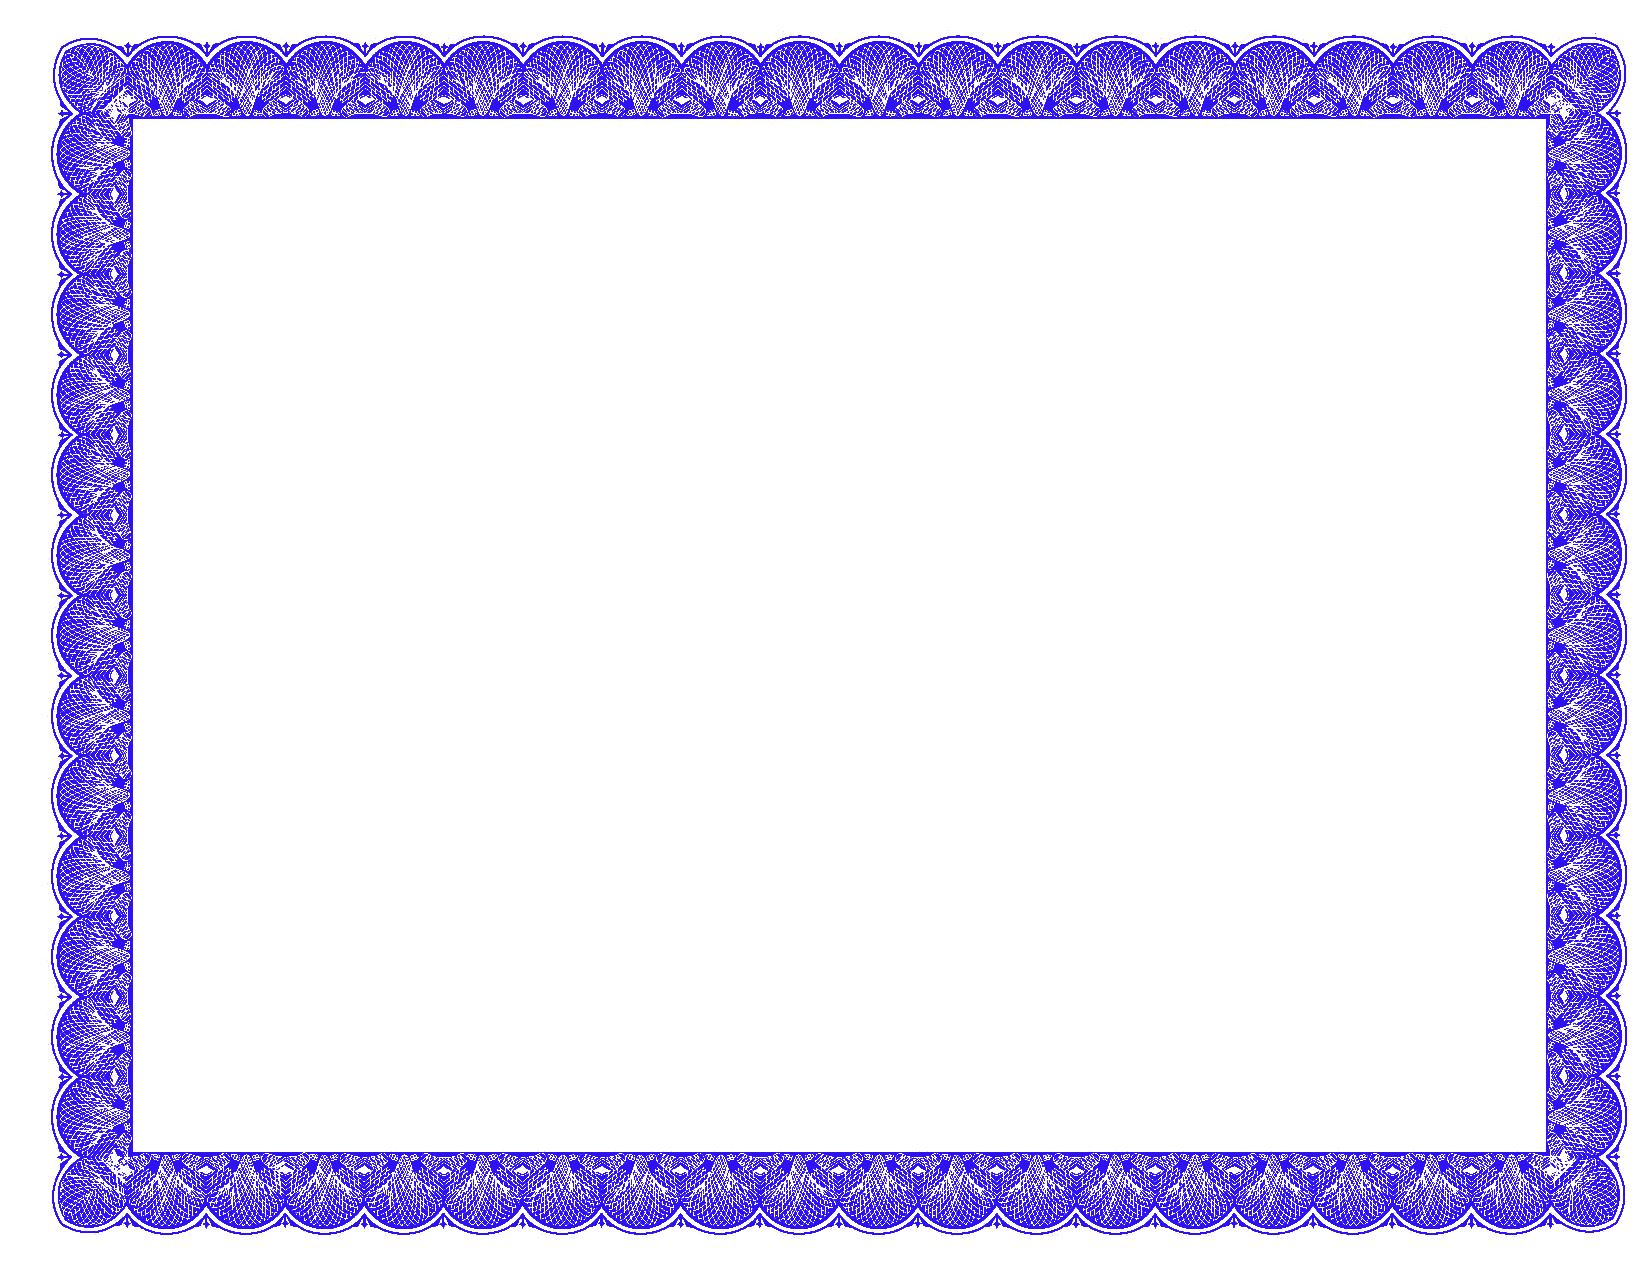 10 Free Certificate Border PSD Images - Blue Certificate Border Clip ... image transparent download